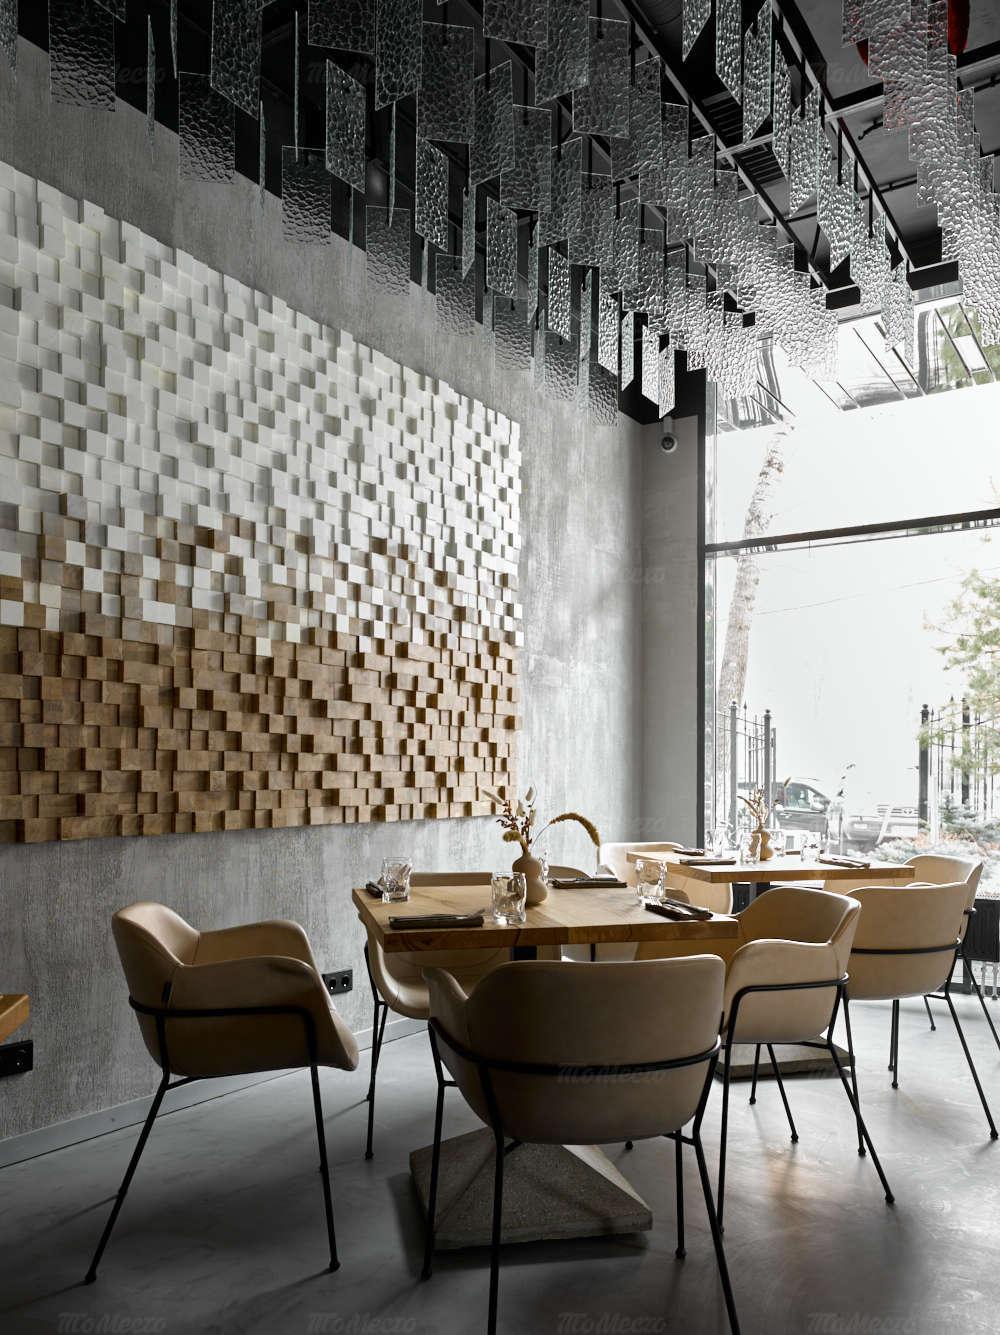 Ресторан Asia Inn (Азиа Инн) на бульваре Генерала Карбышева фото 7